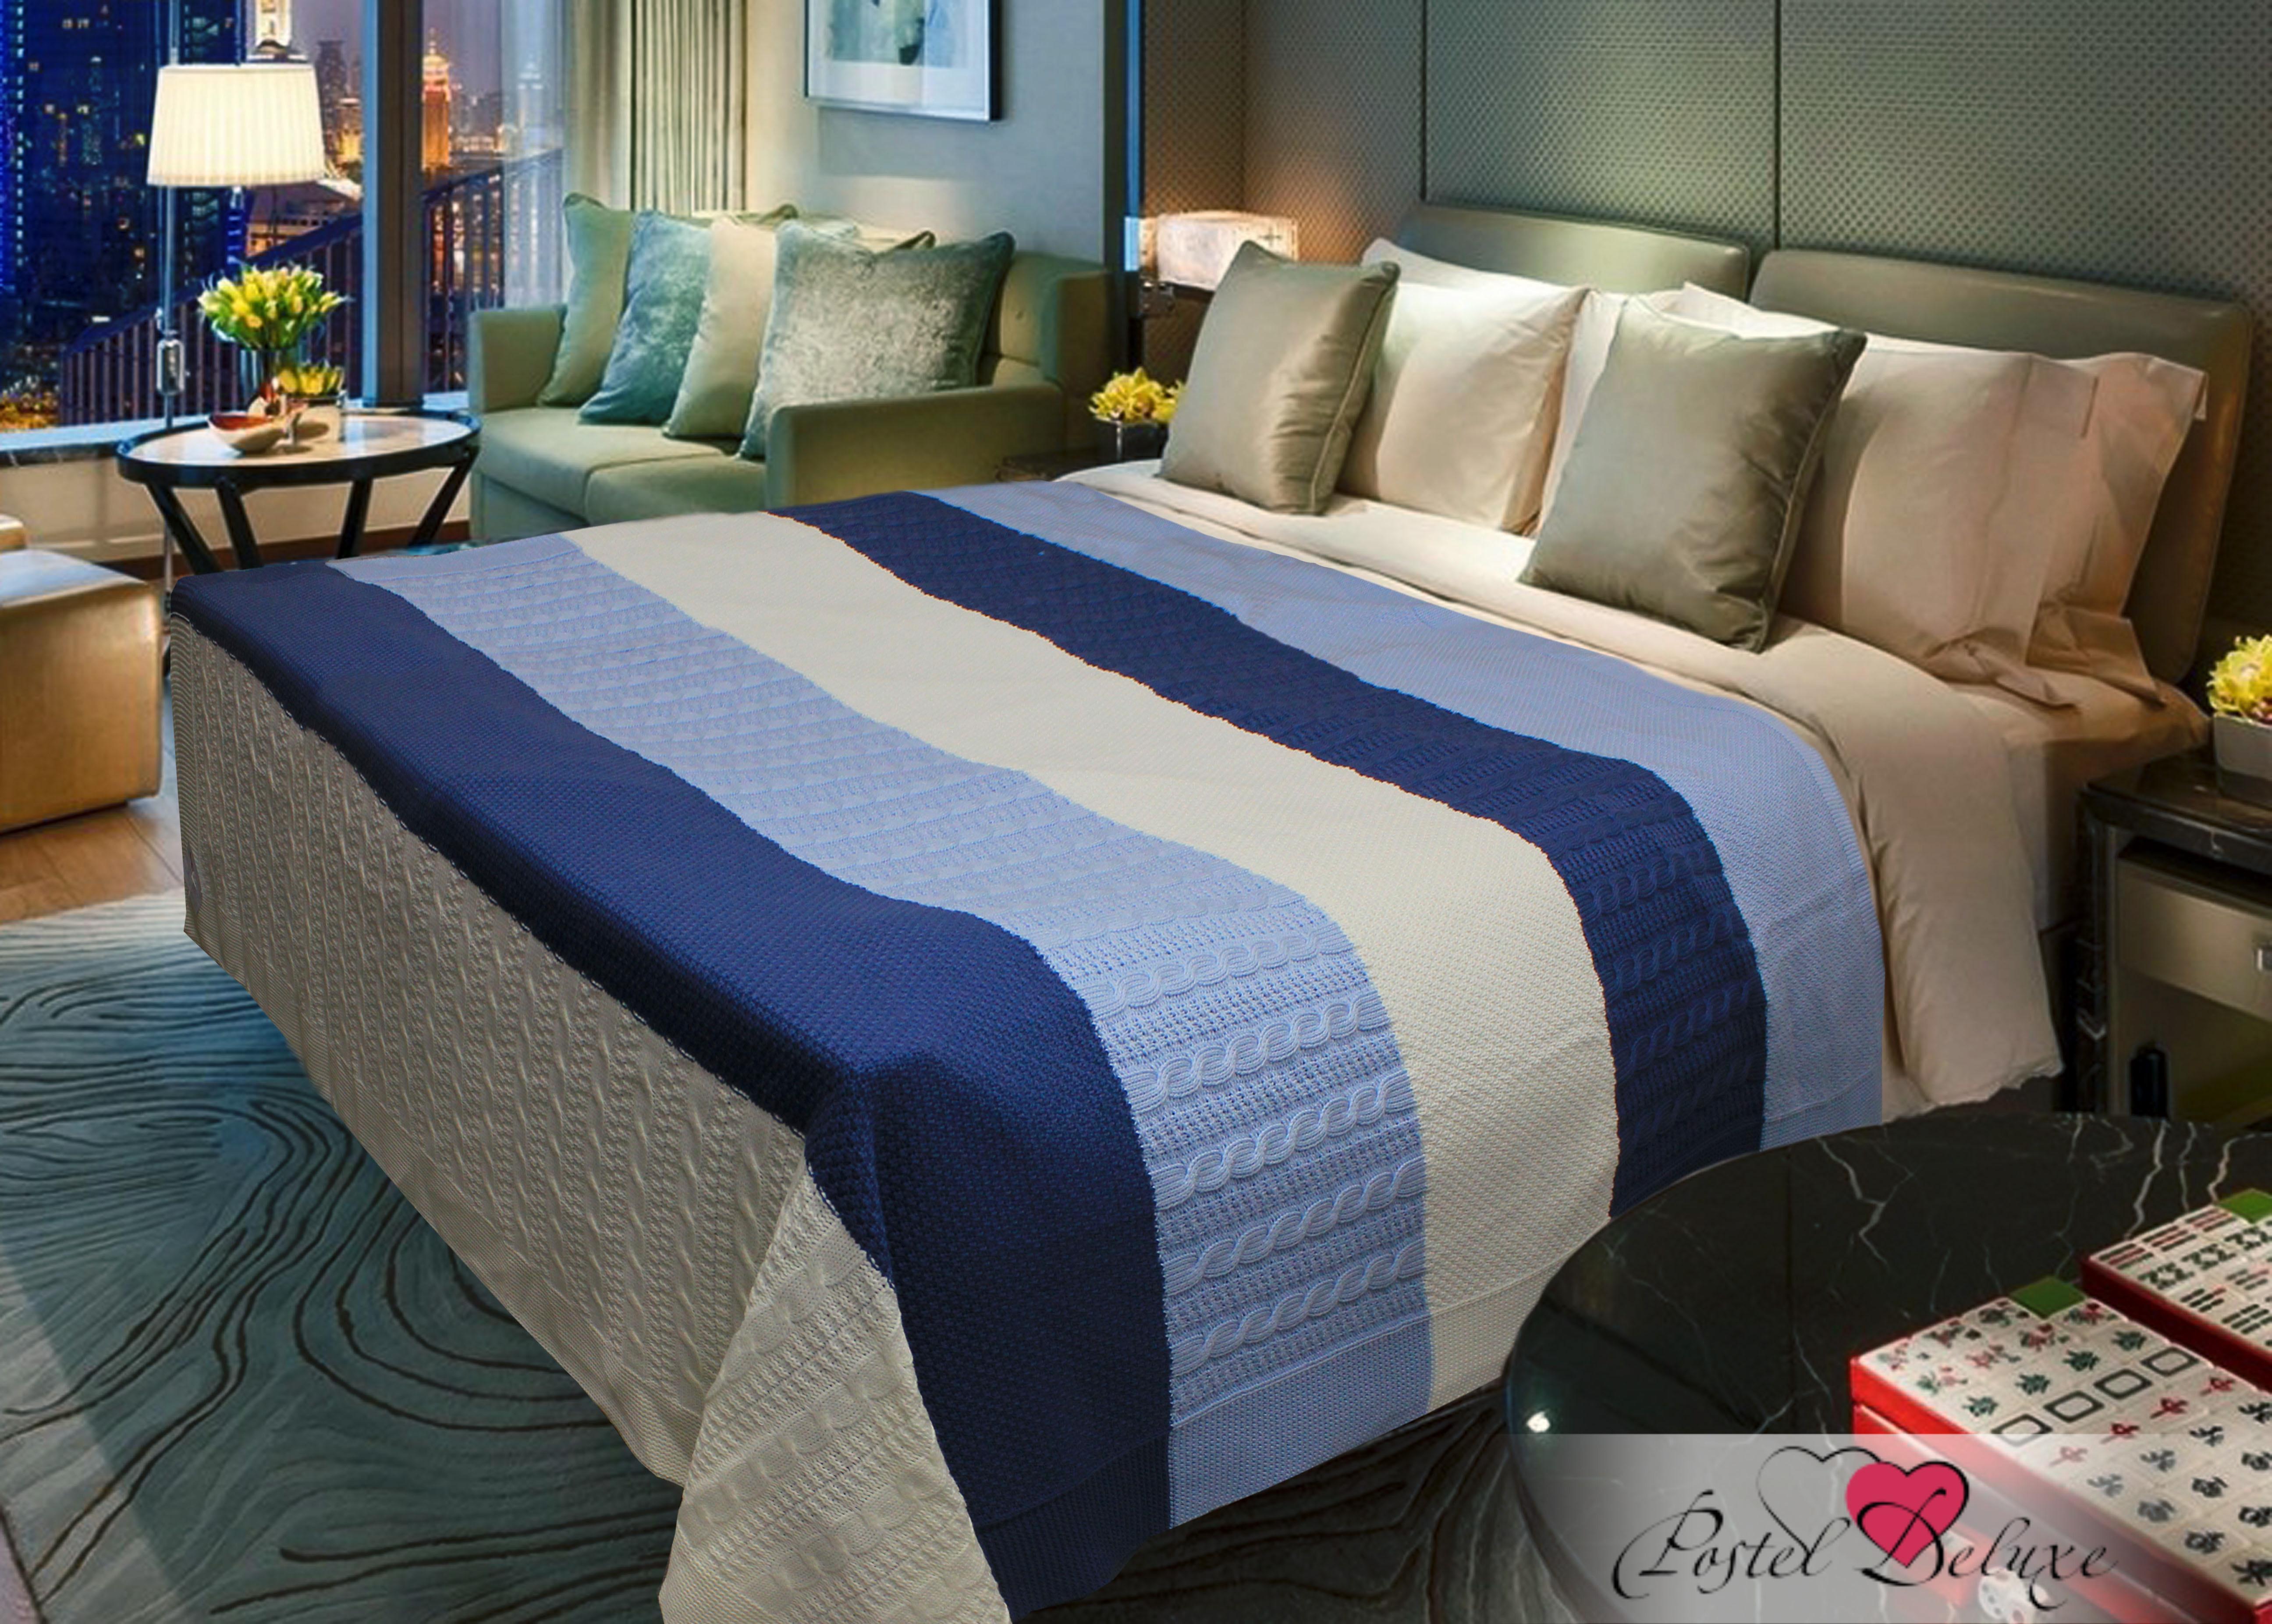 Плед Buenas Noches Плед Luvinia Цвет: Голубой (150х200 см) плед вязаный buenas noches sv lta gy